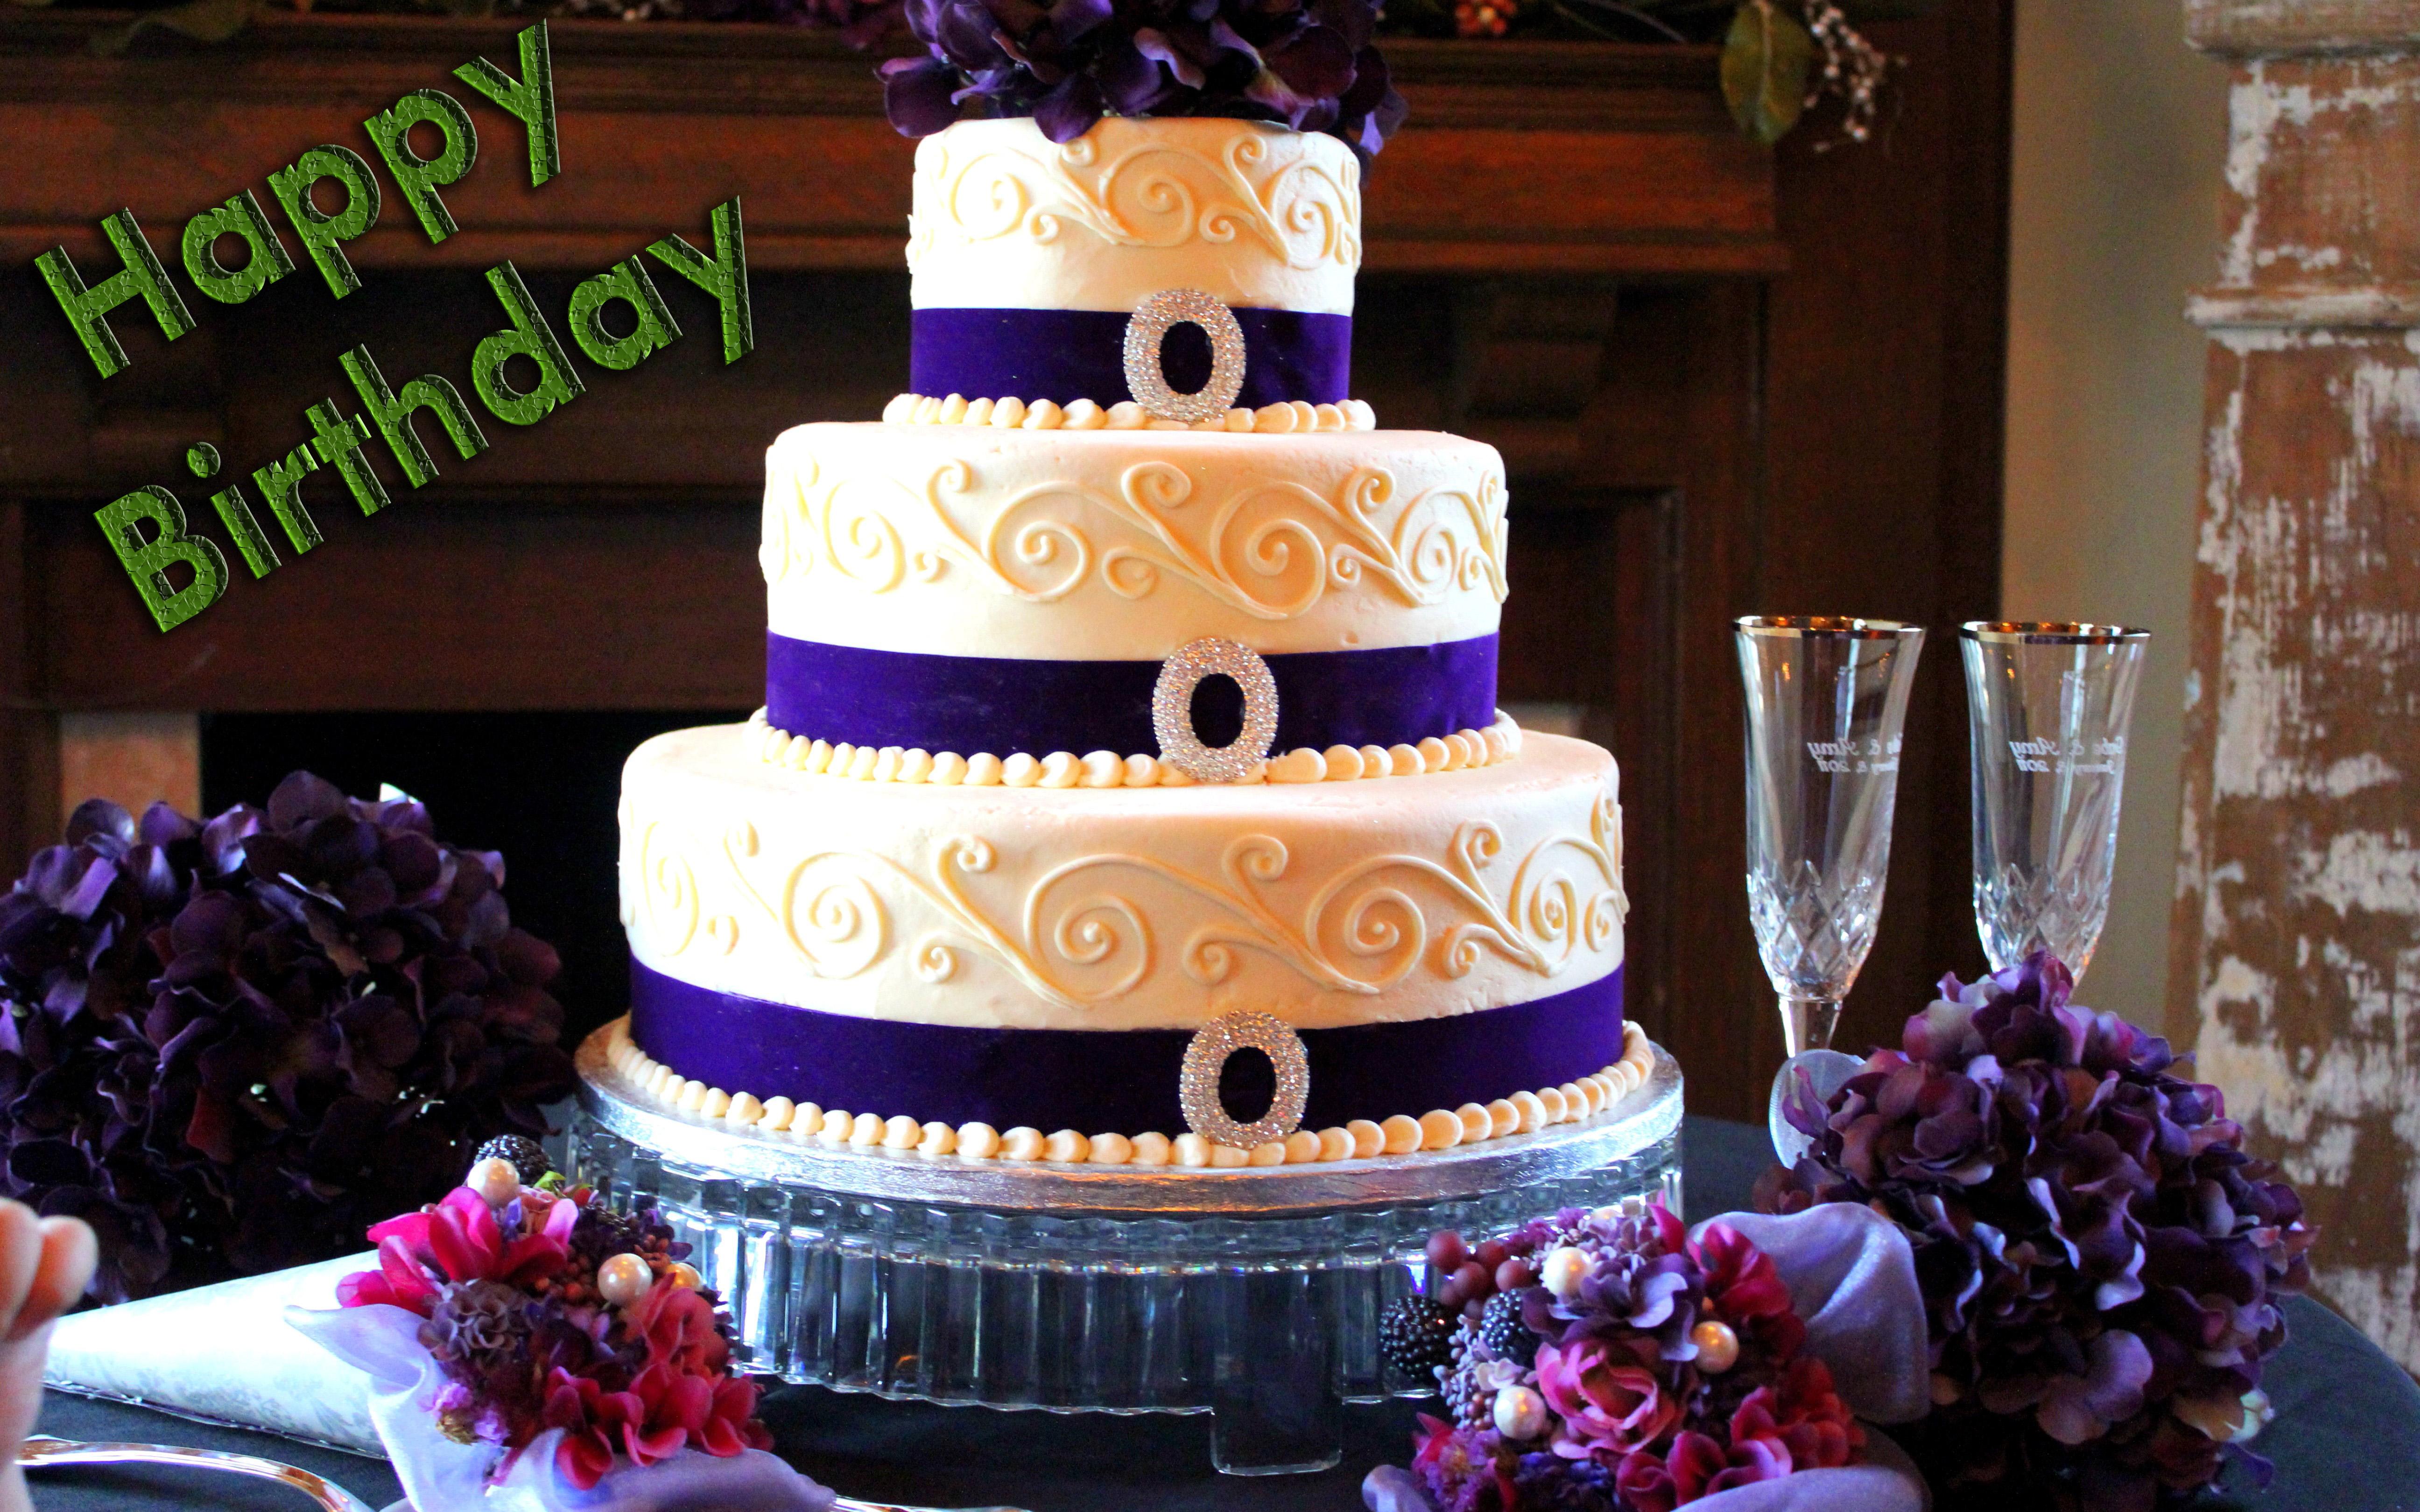 Big Cake Happy Birthday HD Wallpaper Wish 5184x3240